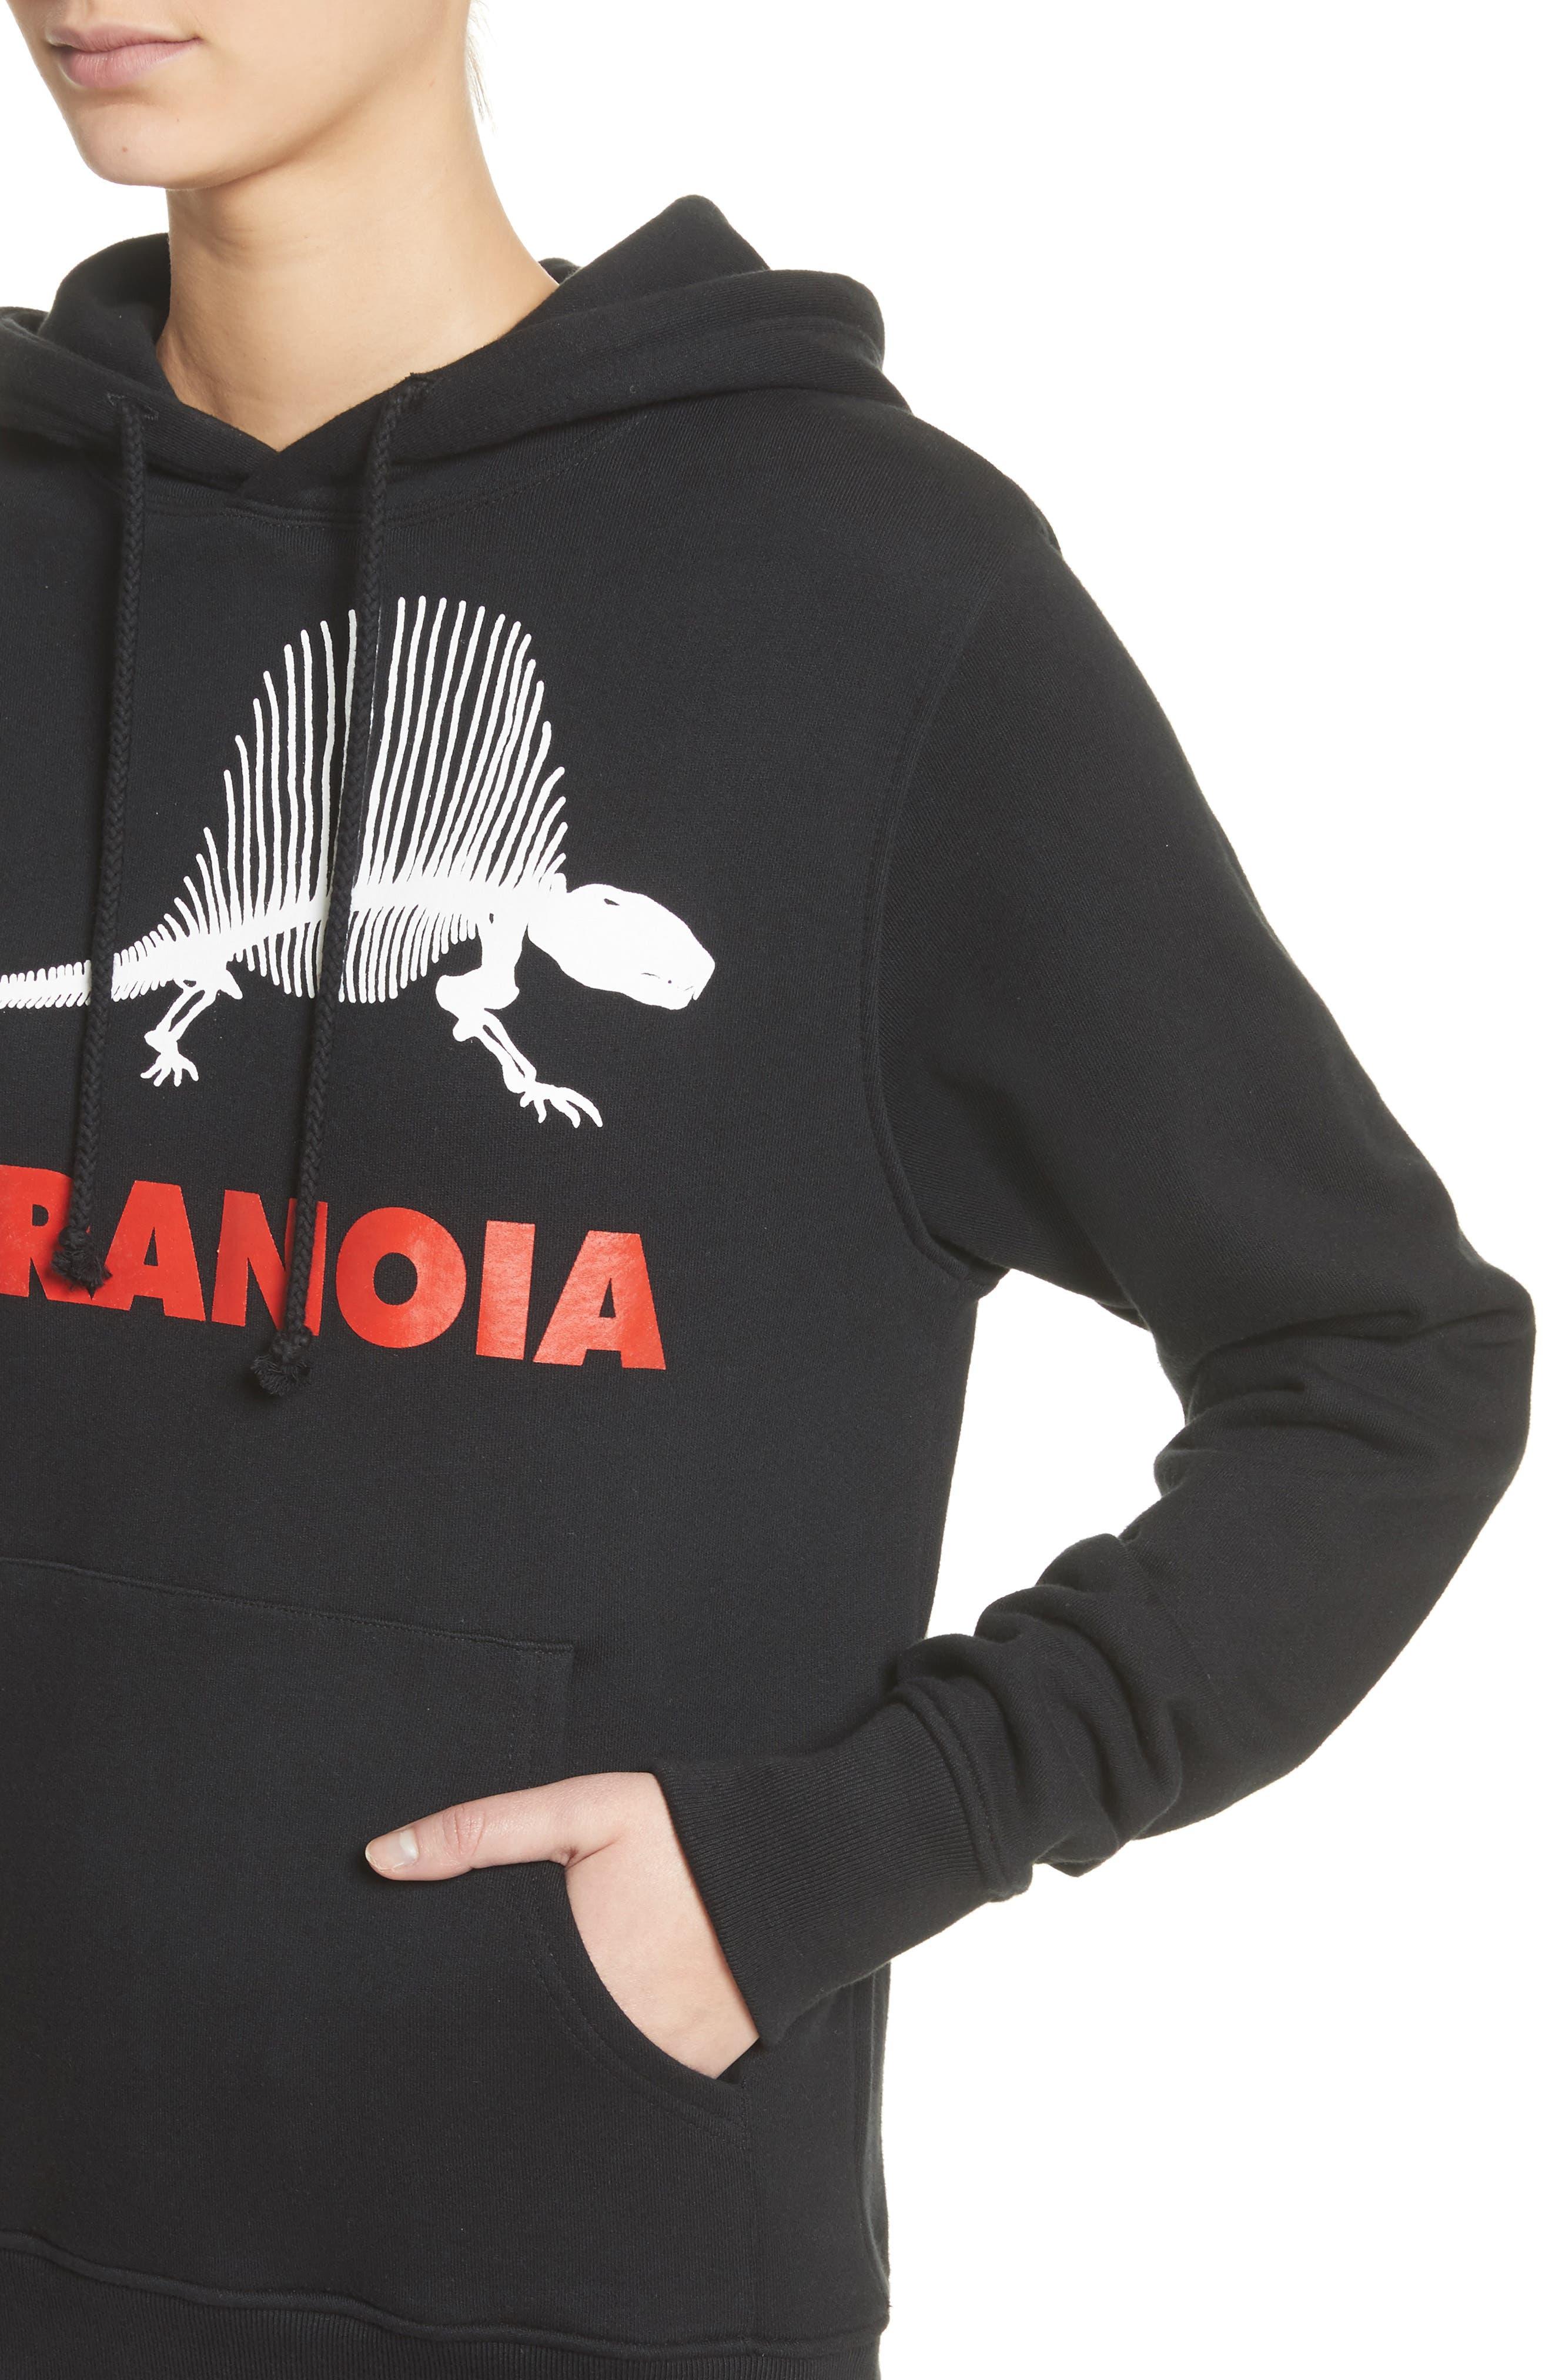 Paranoia Hoodie,                             Alternate thumbnail 4, color,                             Black